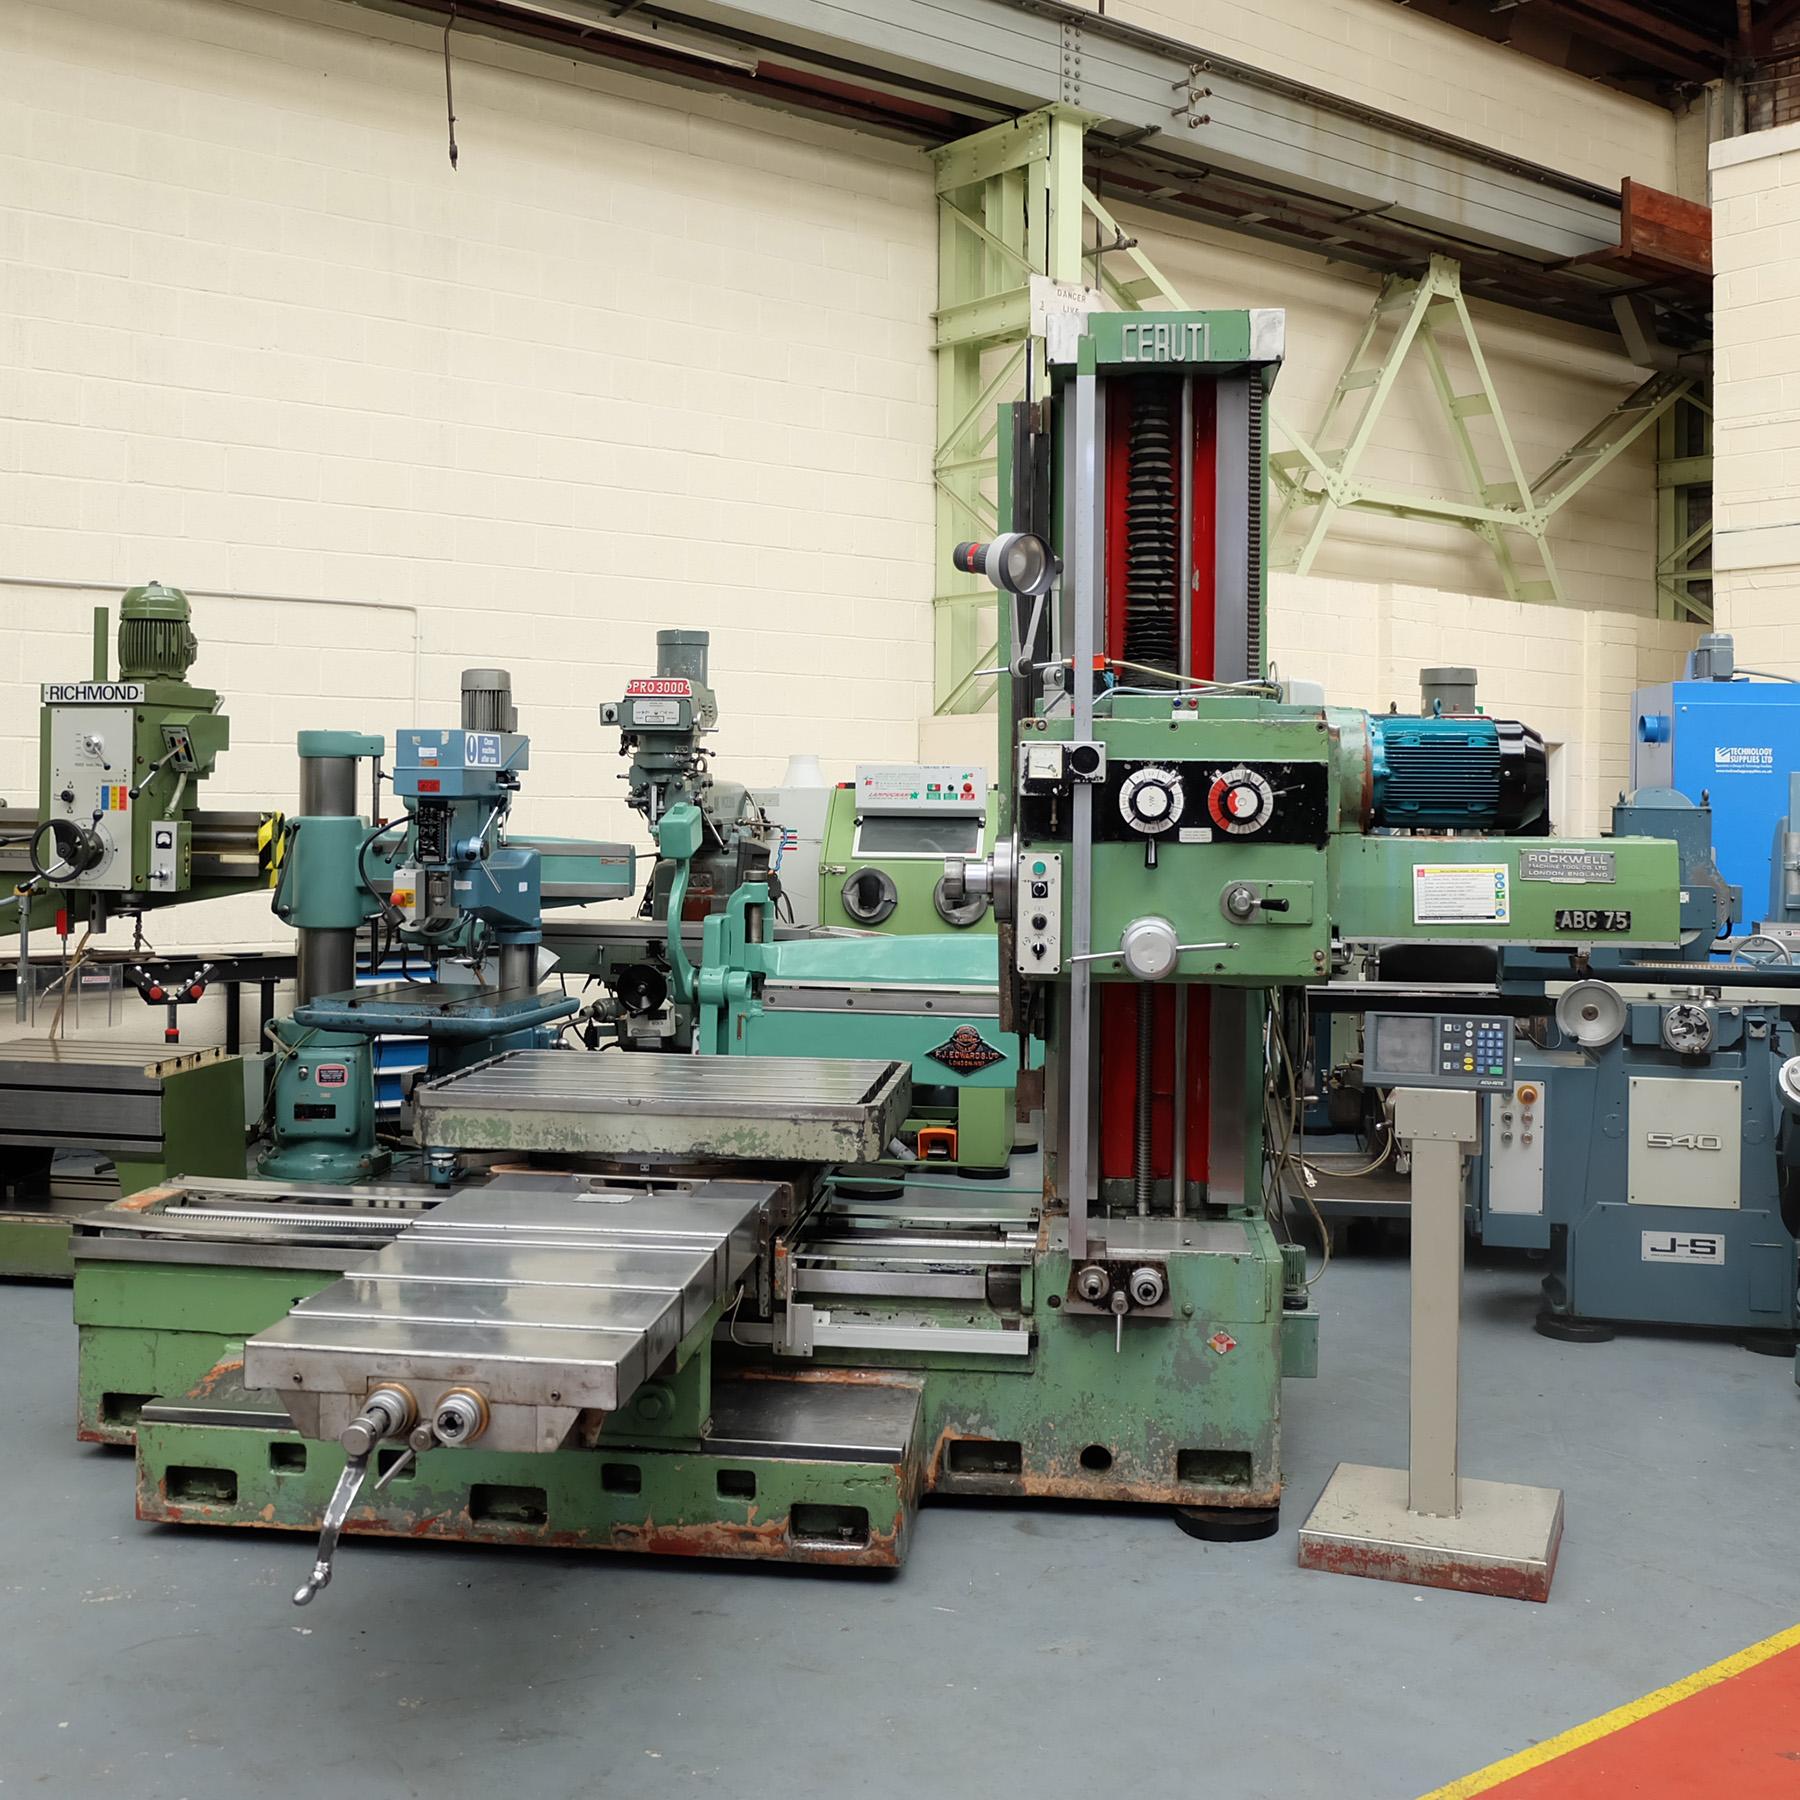 Ceruti Model ABC 75 Horizontal Boring & Milling Machine. With Tooling. - Image 2 of 15